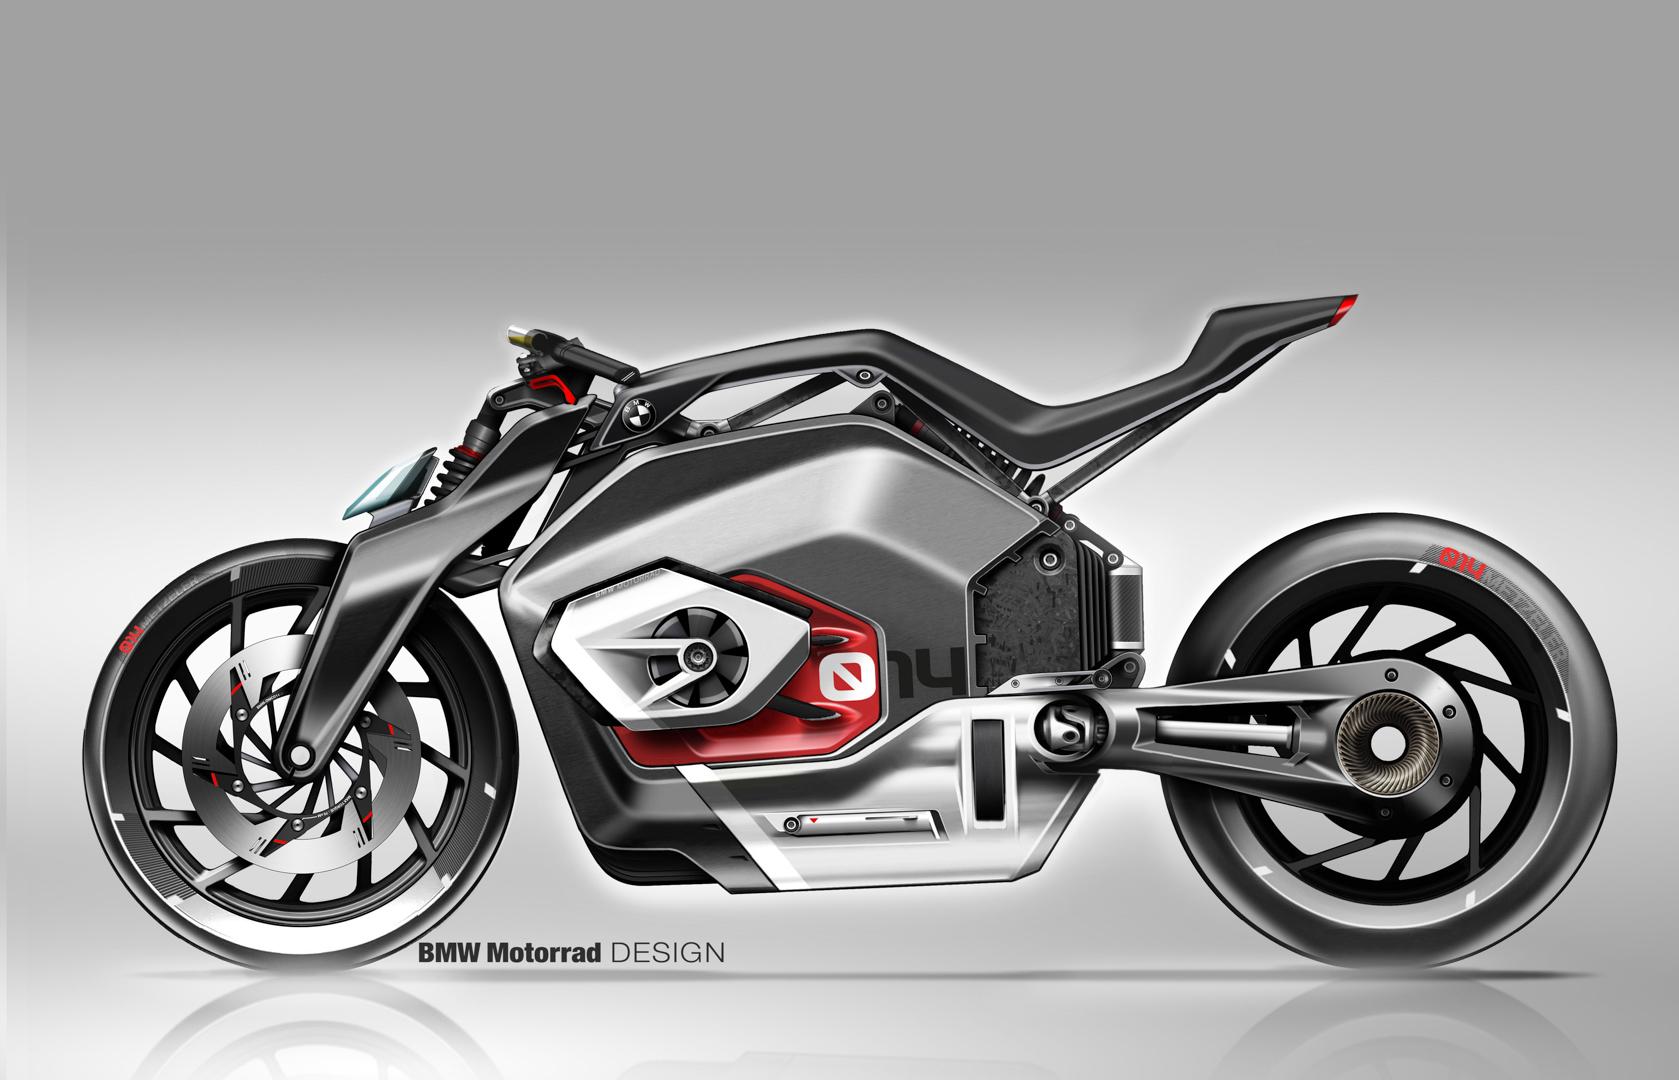 Bmw Power Bike Off 65 Www Maharethane Com